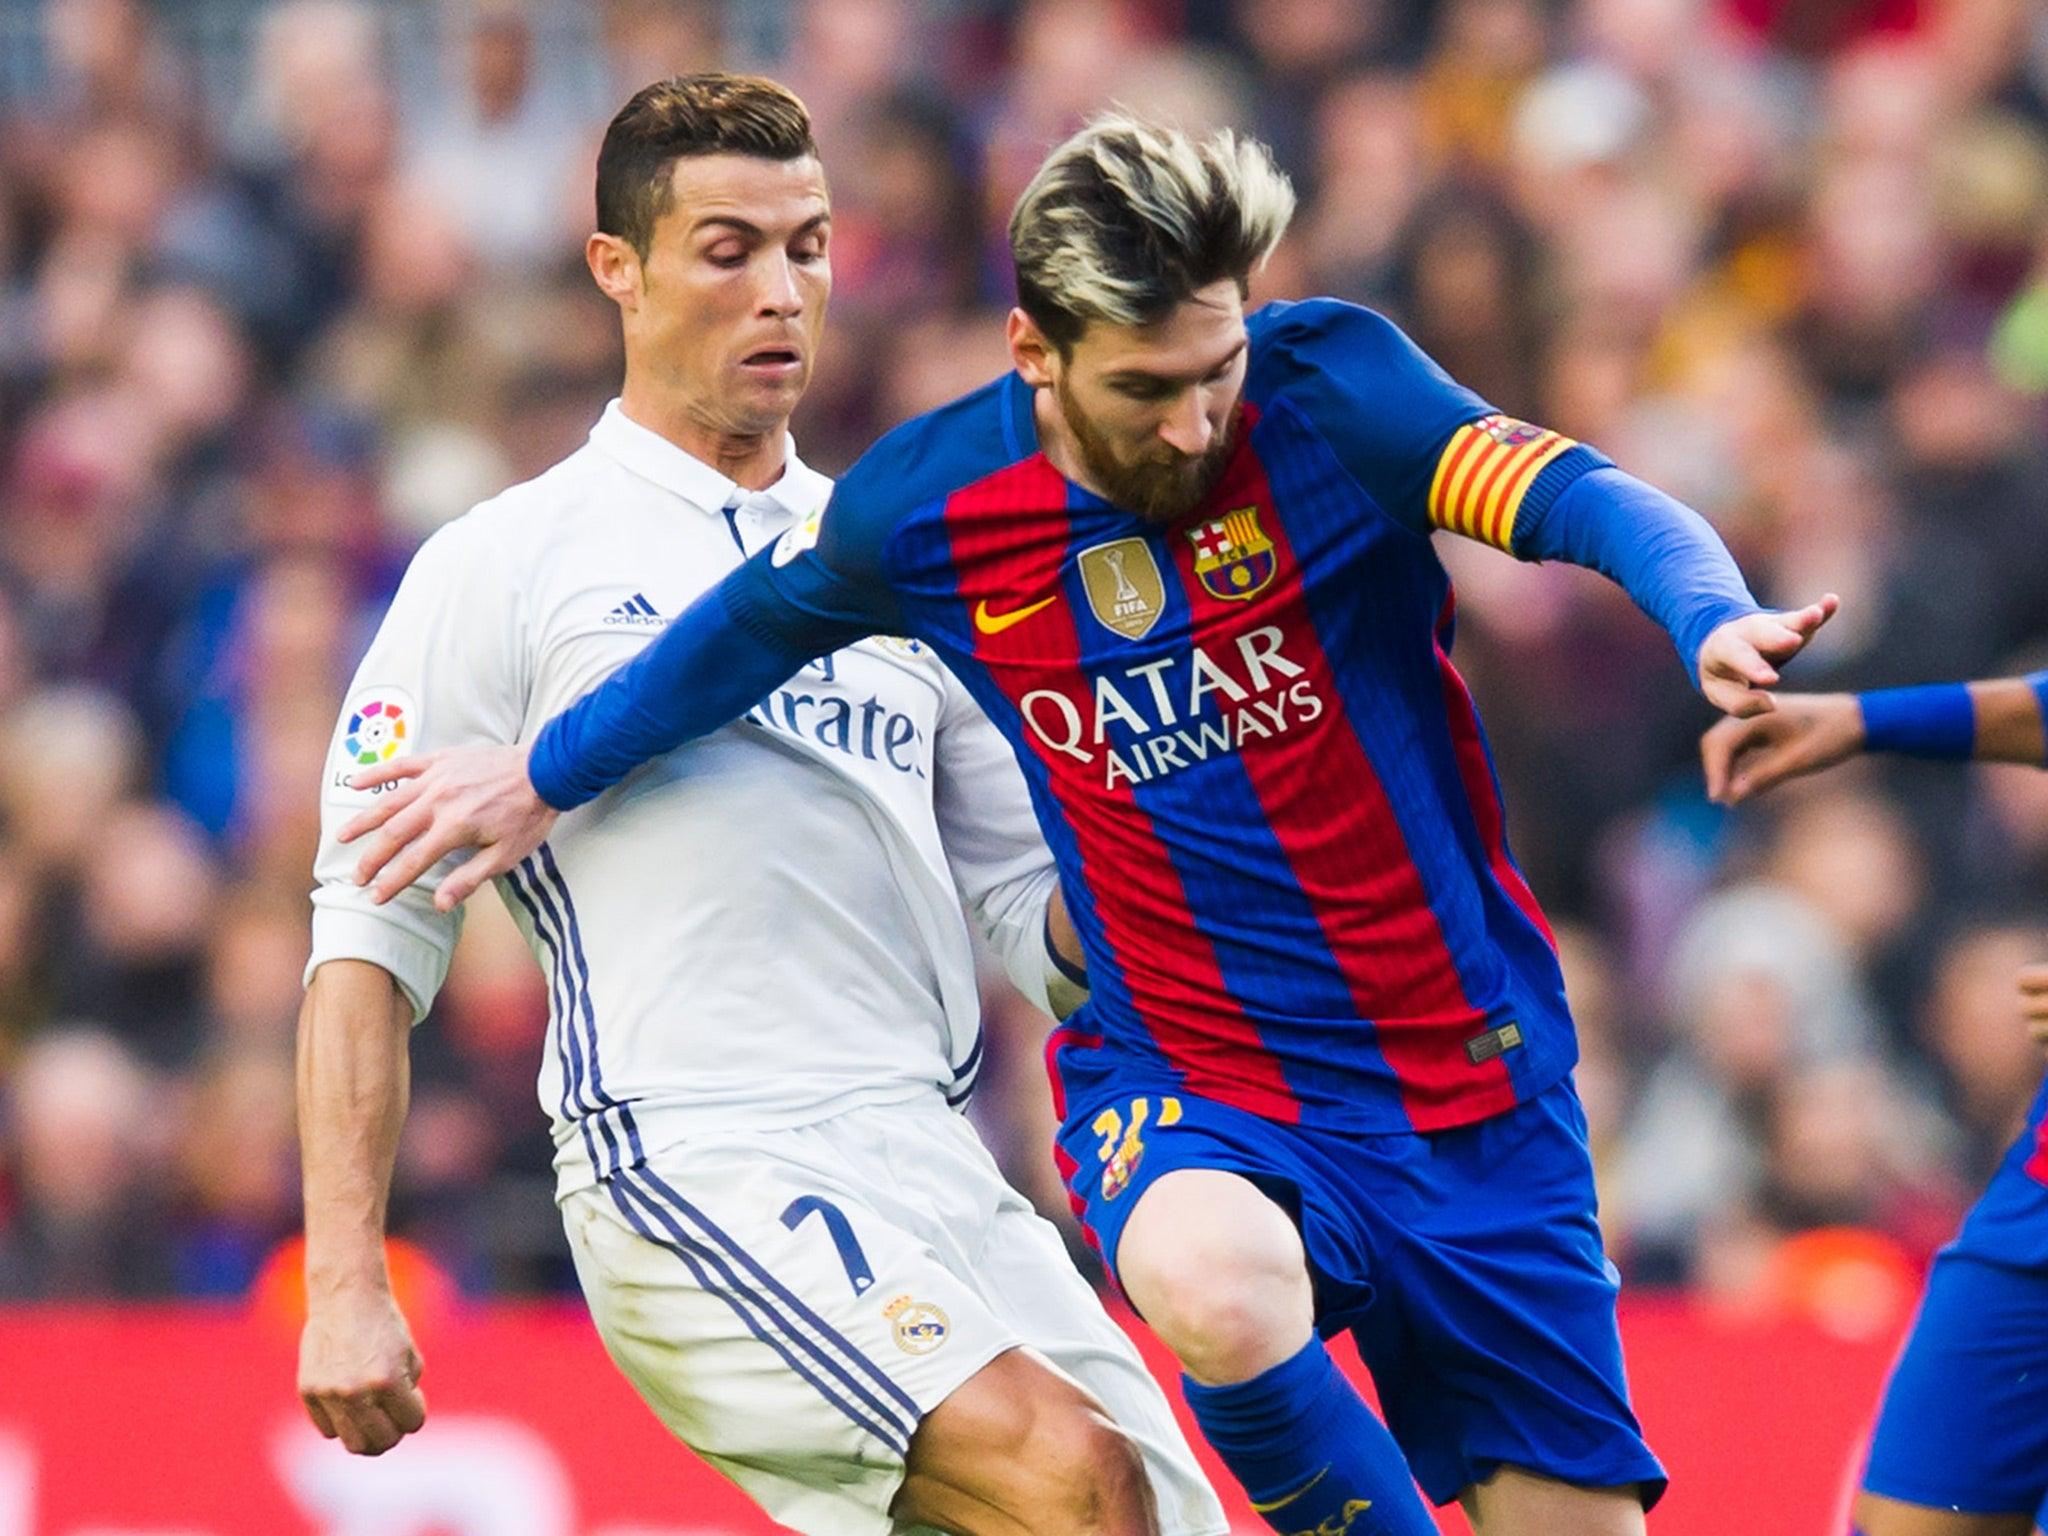 Ballon d'Or 2016: Winner 'leaked' with Cristiano Ronaldo ...